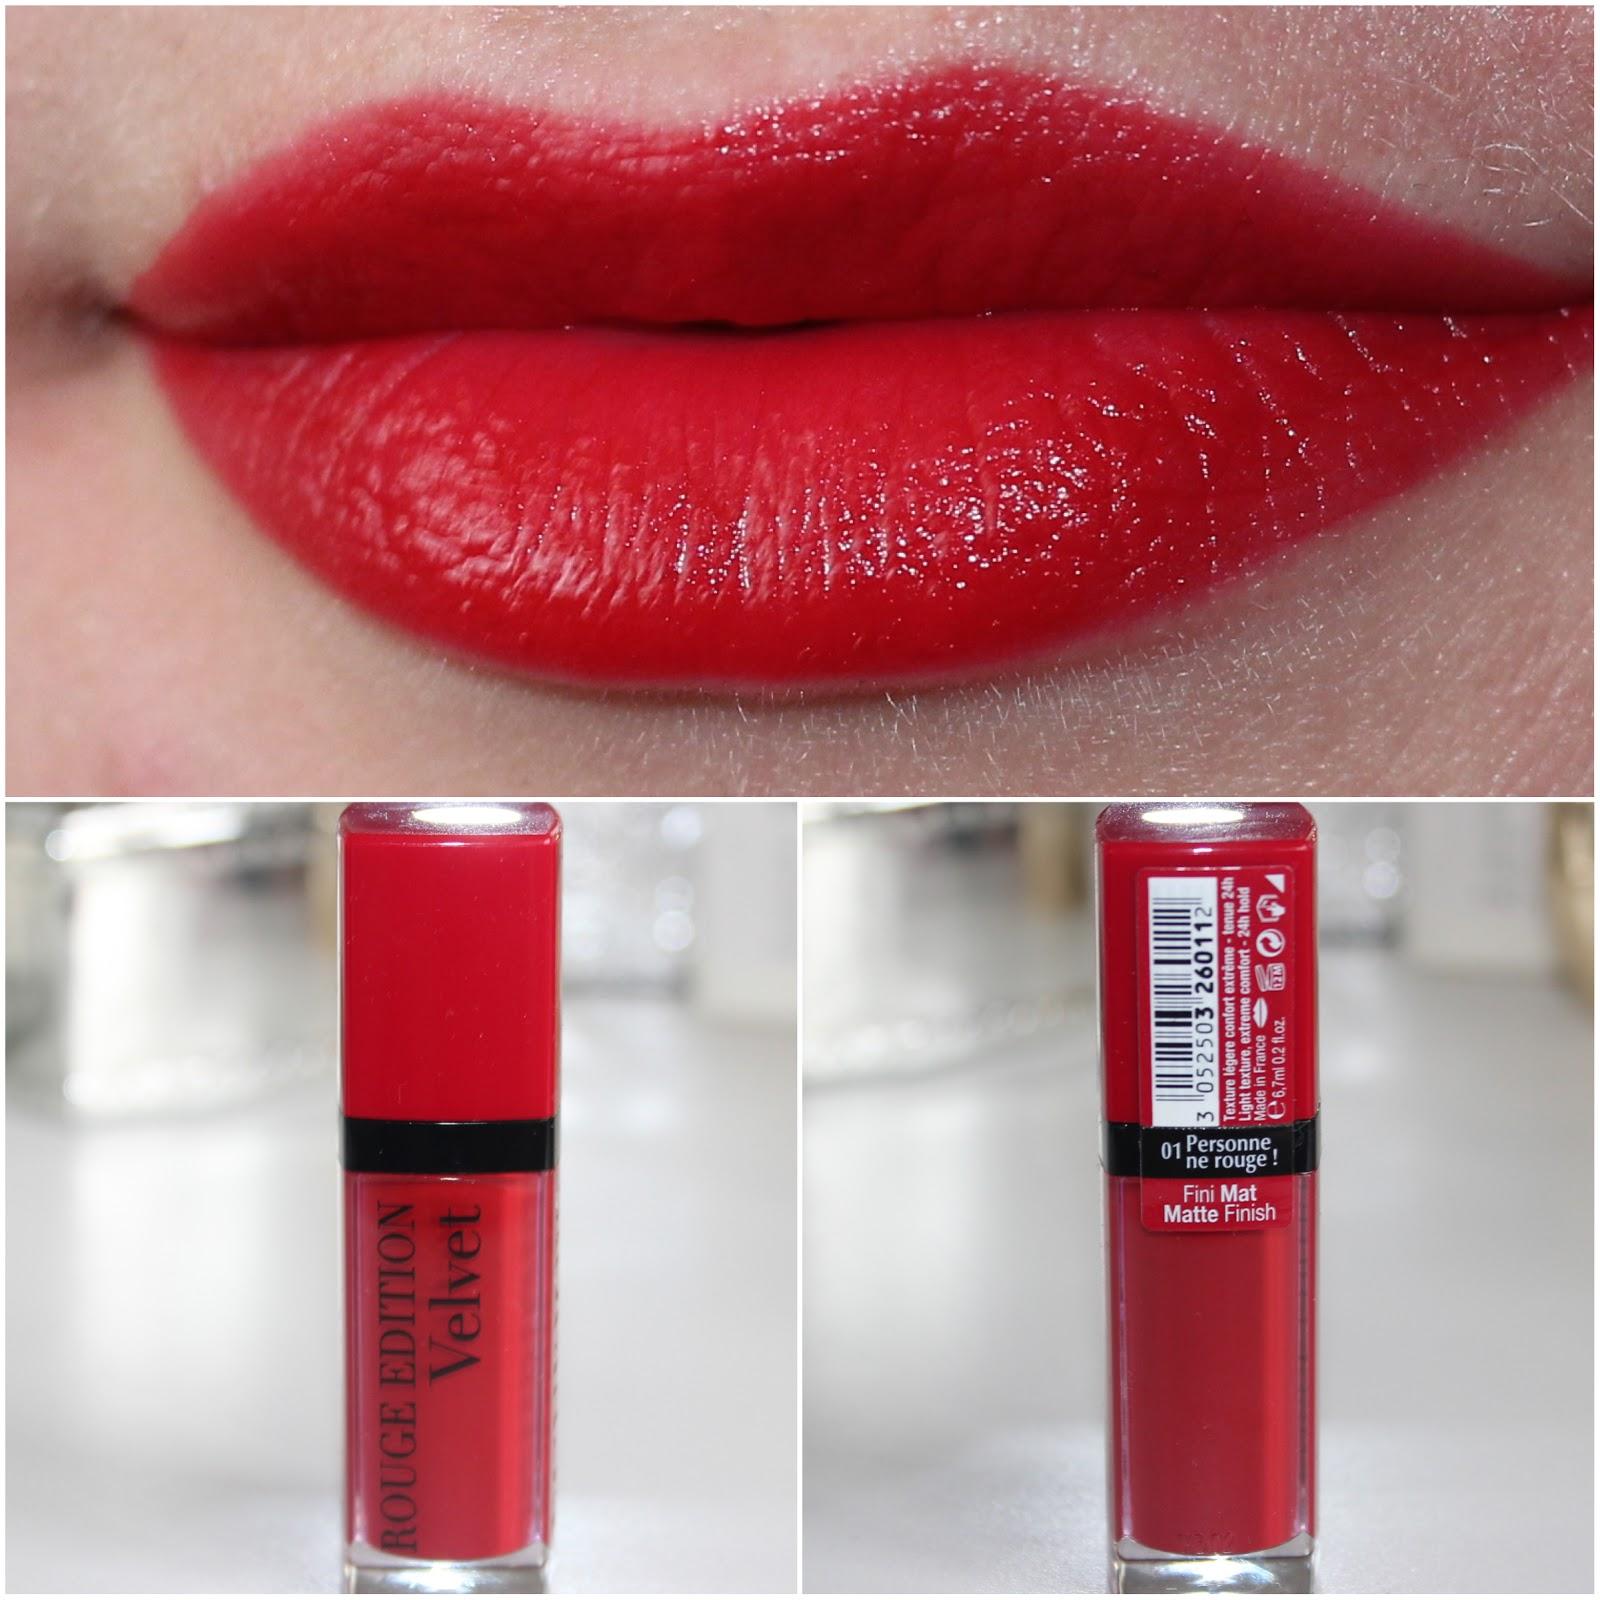 Оттенок №1 Personne ne rouge из линейки матовых помад Rouge Edition Velvet от Bourjois